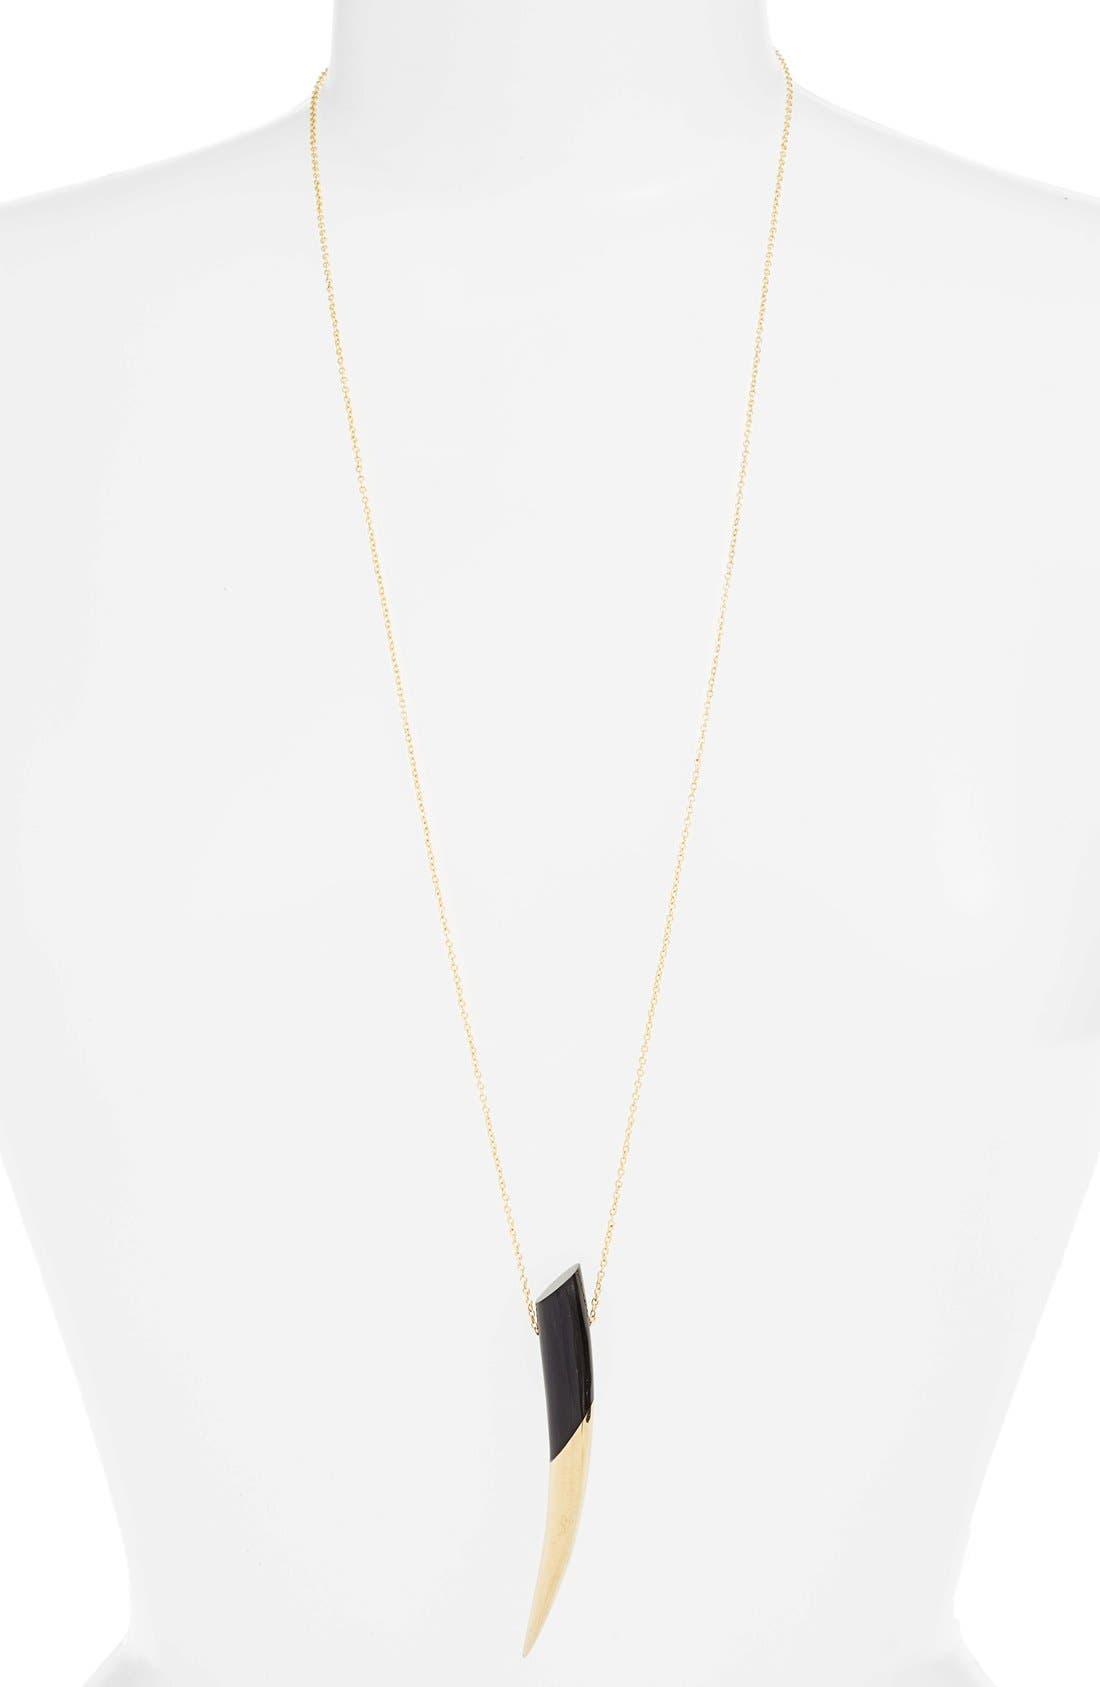 Dalili Horn Pendant Necklace,                             Main thumbnail 1, color,                             005